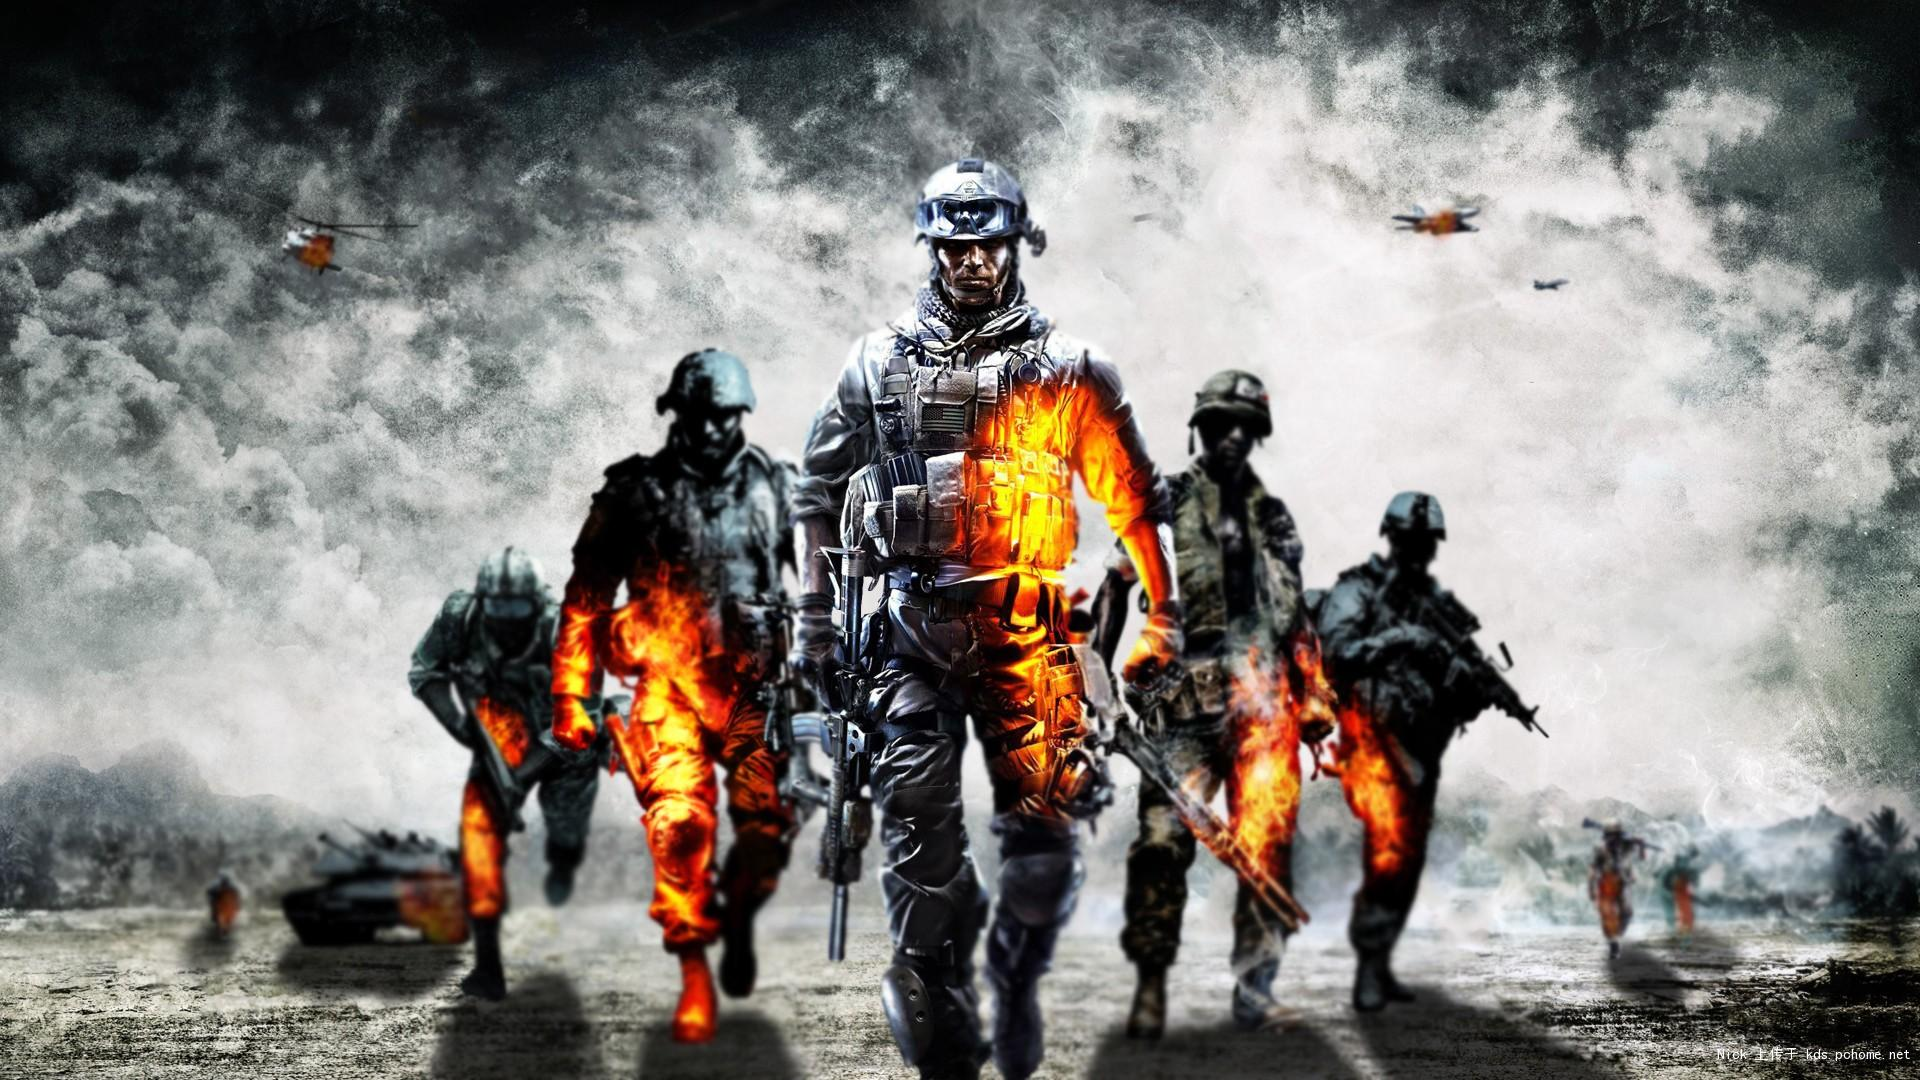 Battlefield 4 Games Wallpaper HD 1920x1080 ImageBankbiz 1920x1080